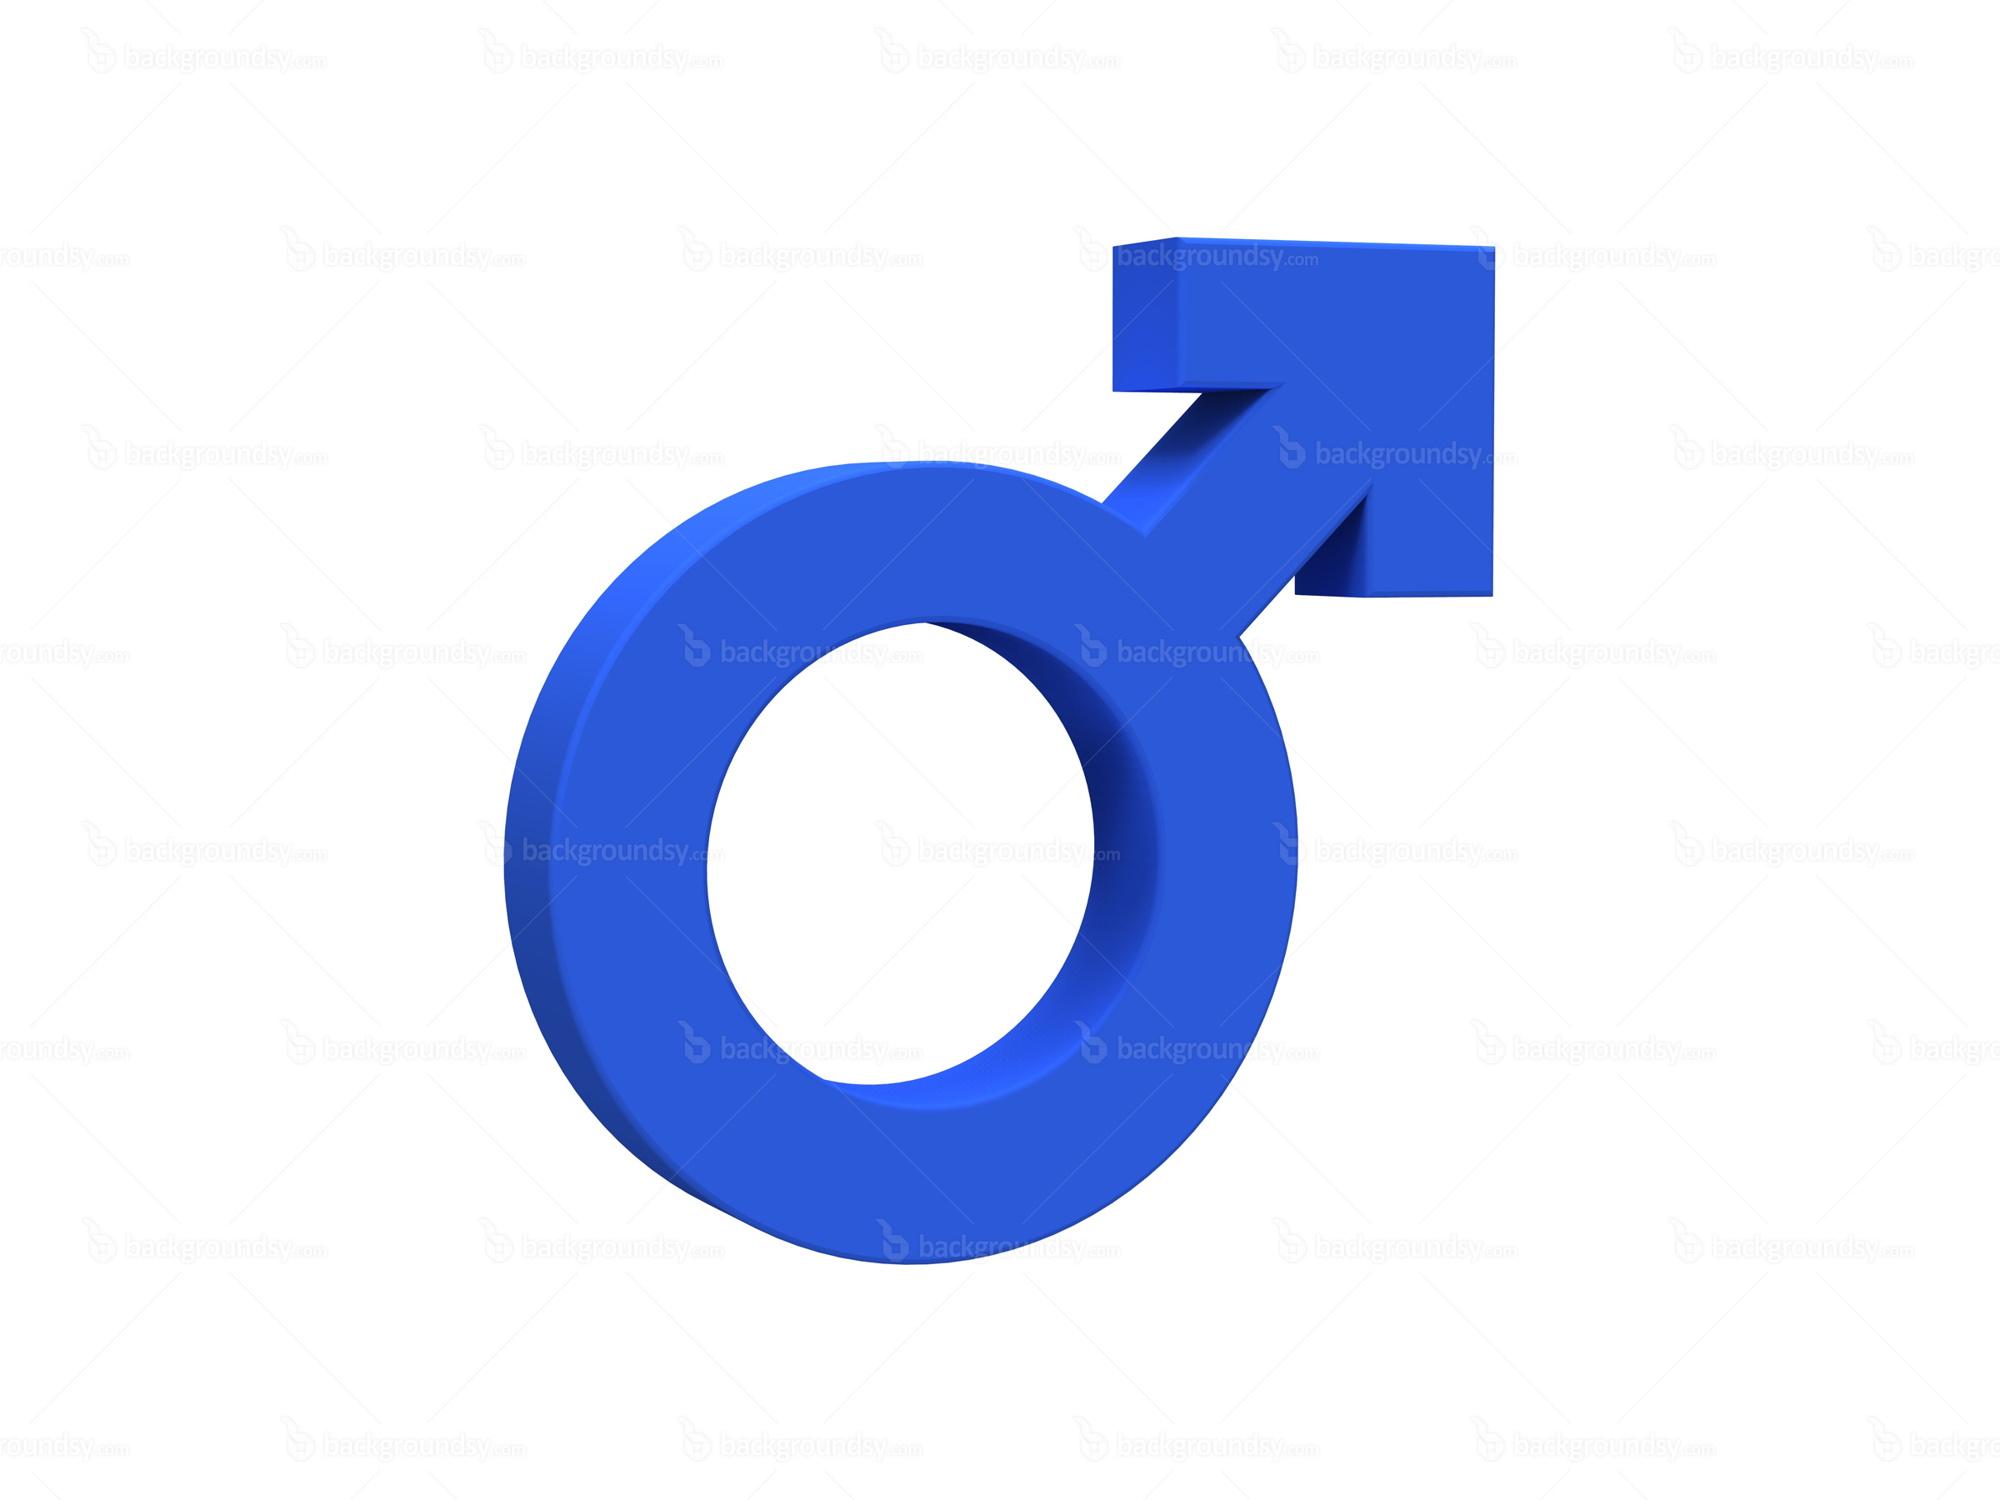 Male Symbol Backgroundsy Com